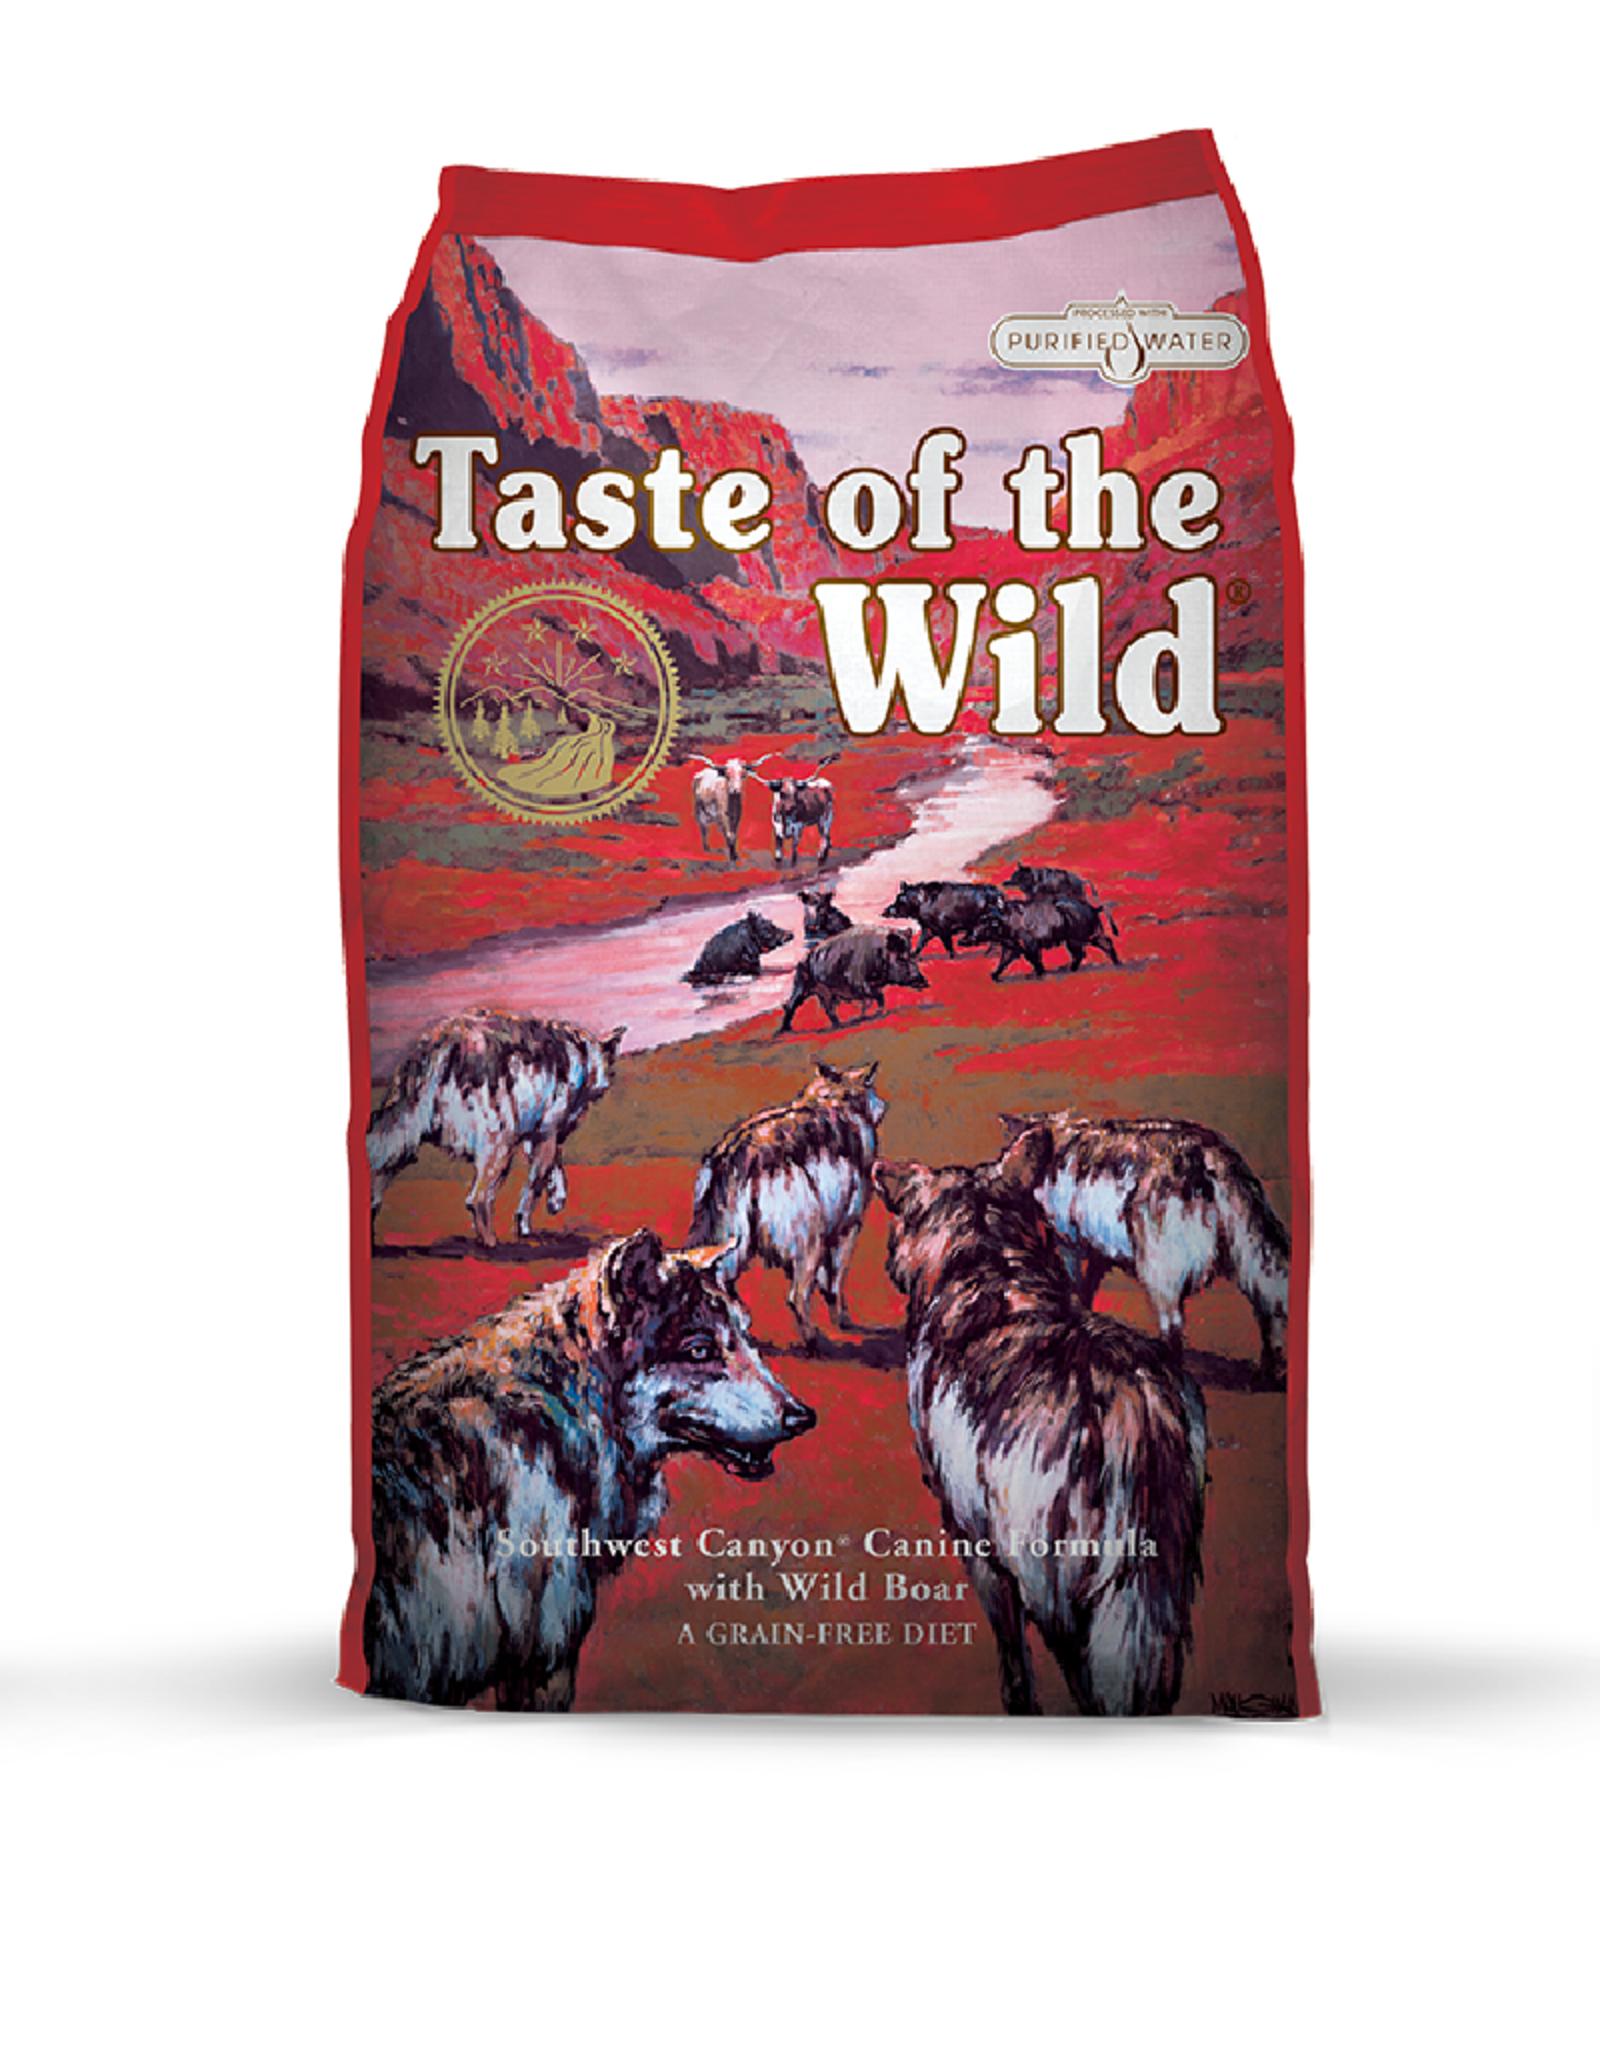 Taste of the Wild Taste of the Wild | Southwest Canyon Canine